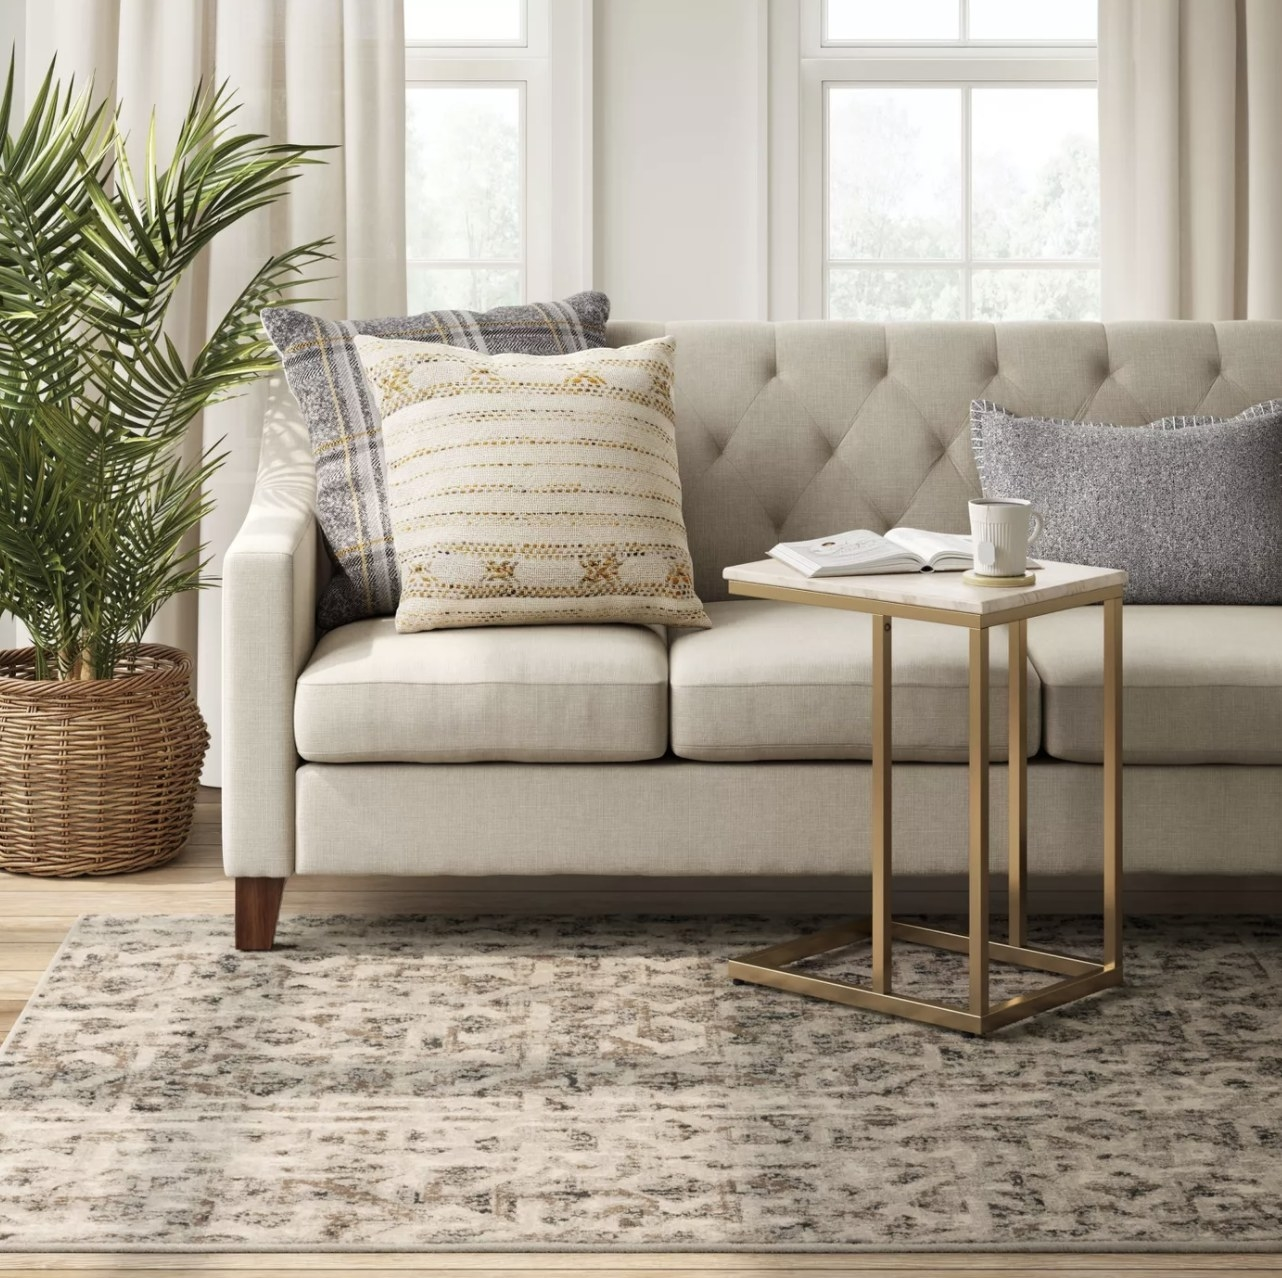 Carpet on the floor of living room